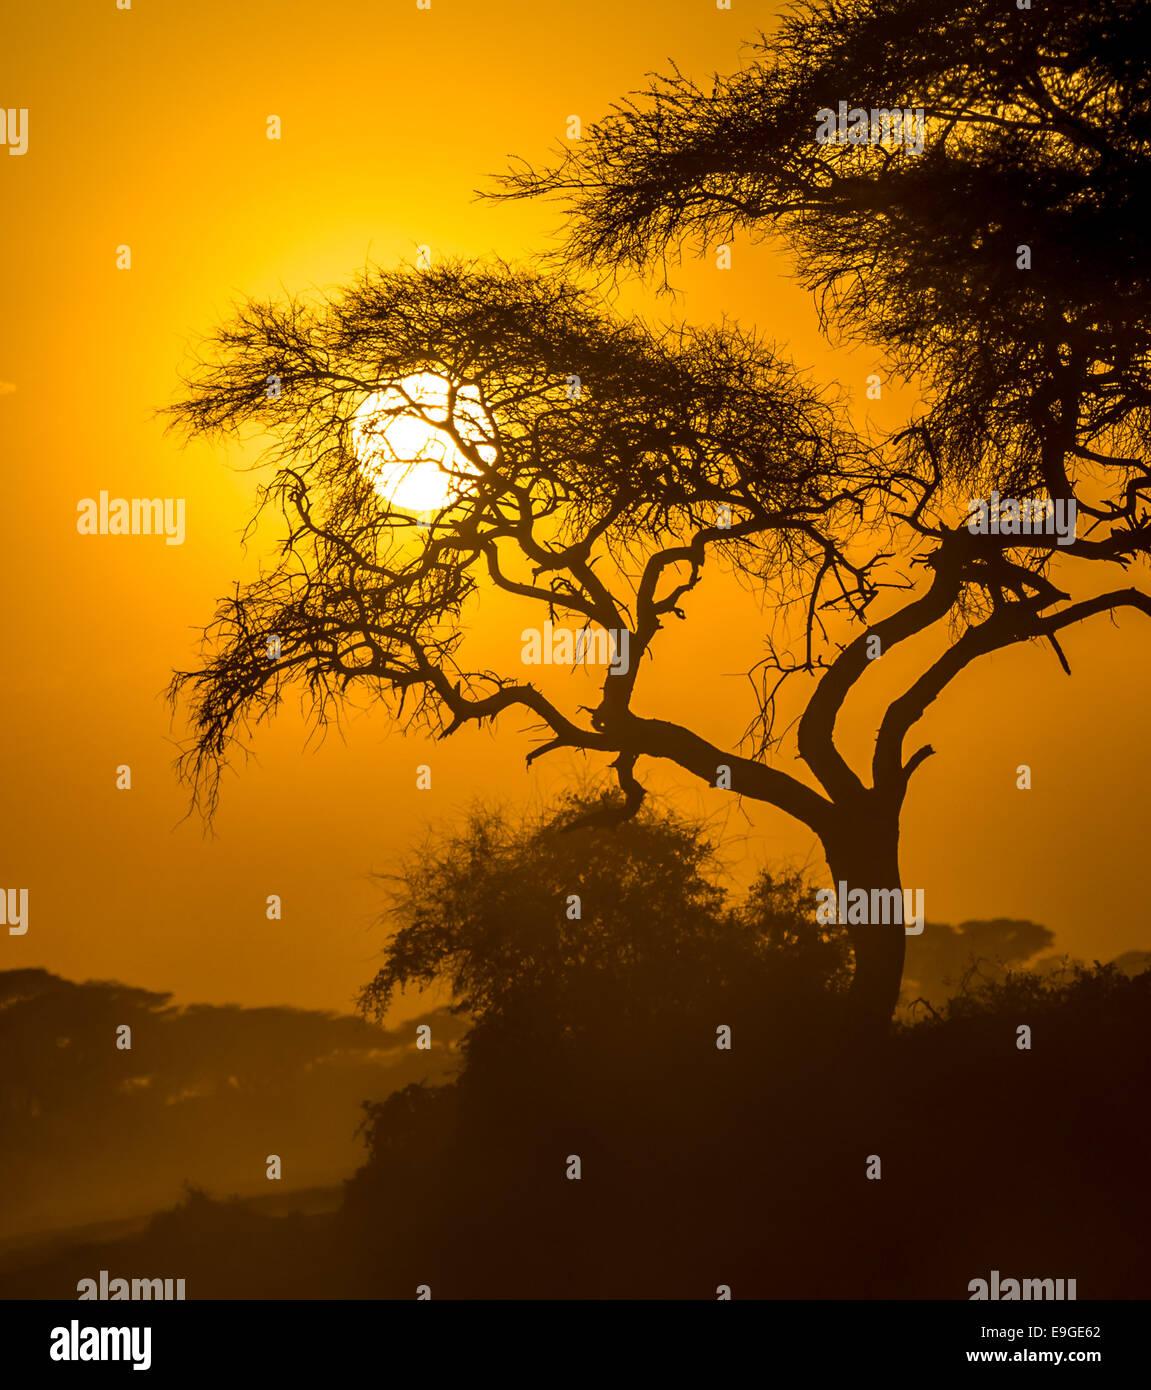 african sunset in savannah - Stock Image